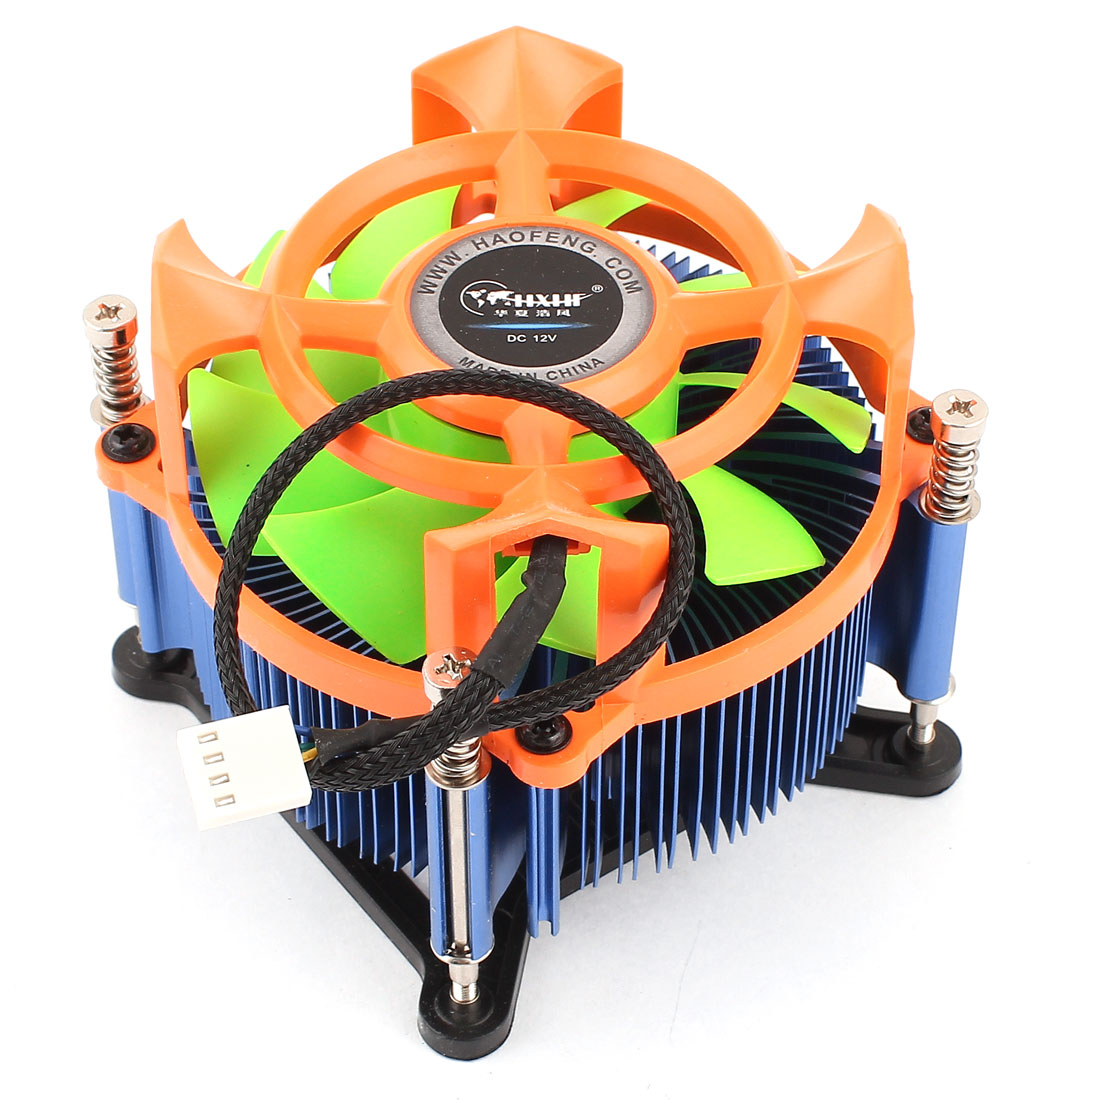 DC 12V 25dB 4Pins Connector CPU Cooler Cooling Fan Heatsink for Intel Socket 95W